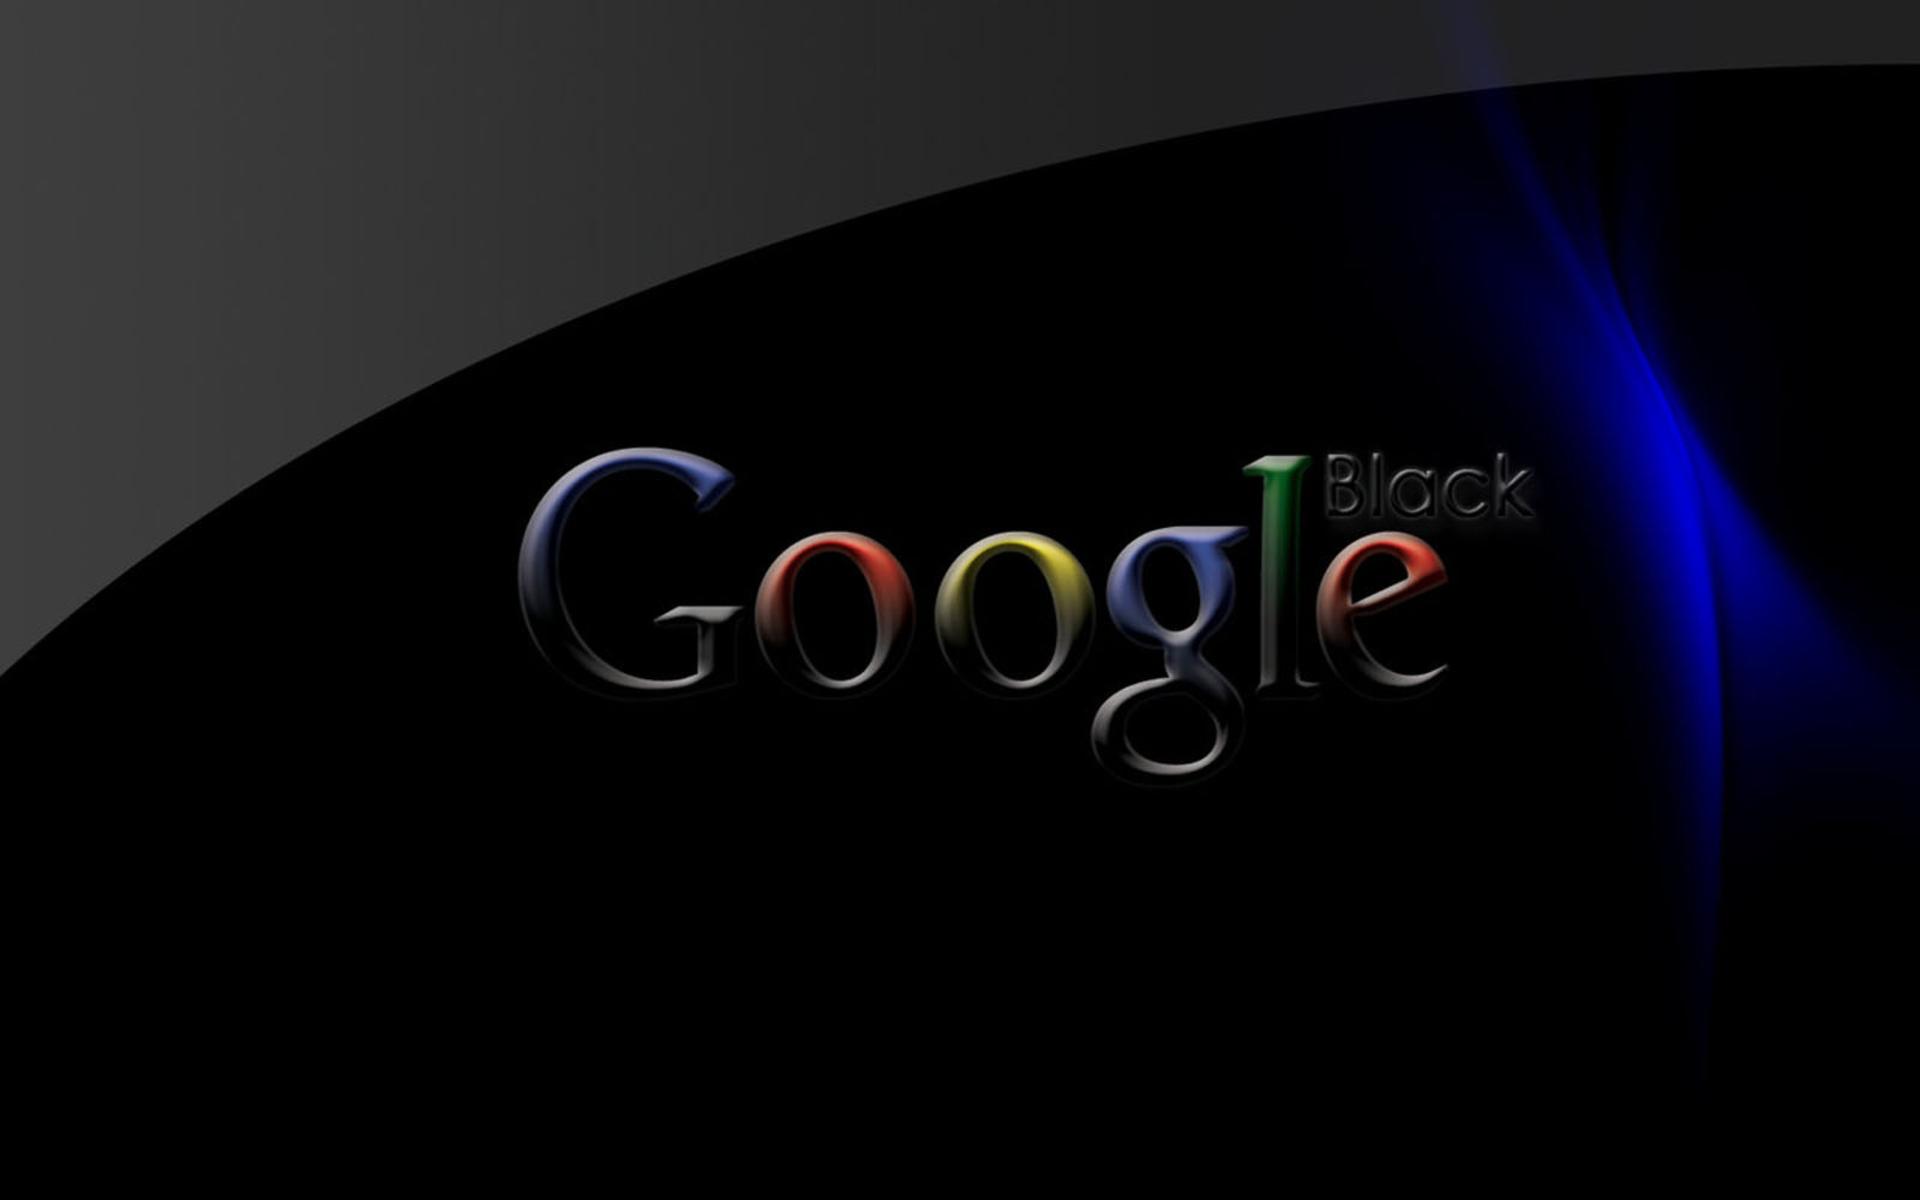 Google Hd Wallpaper 1920x1200